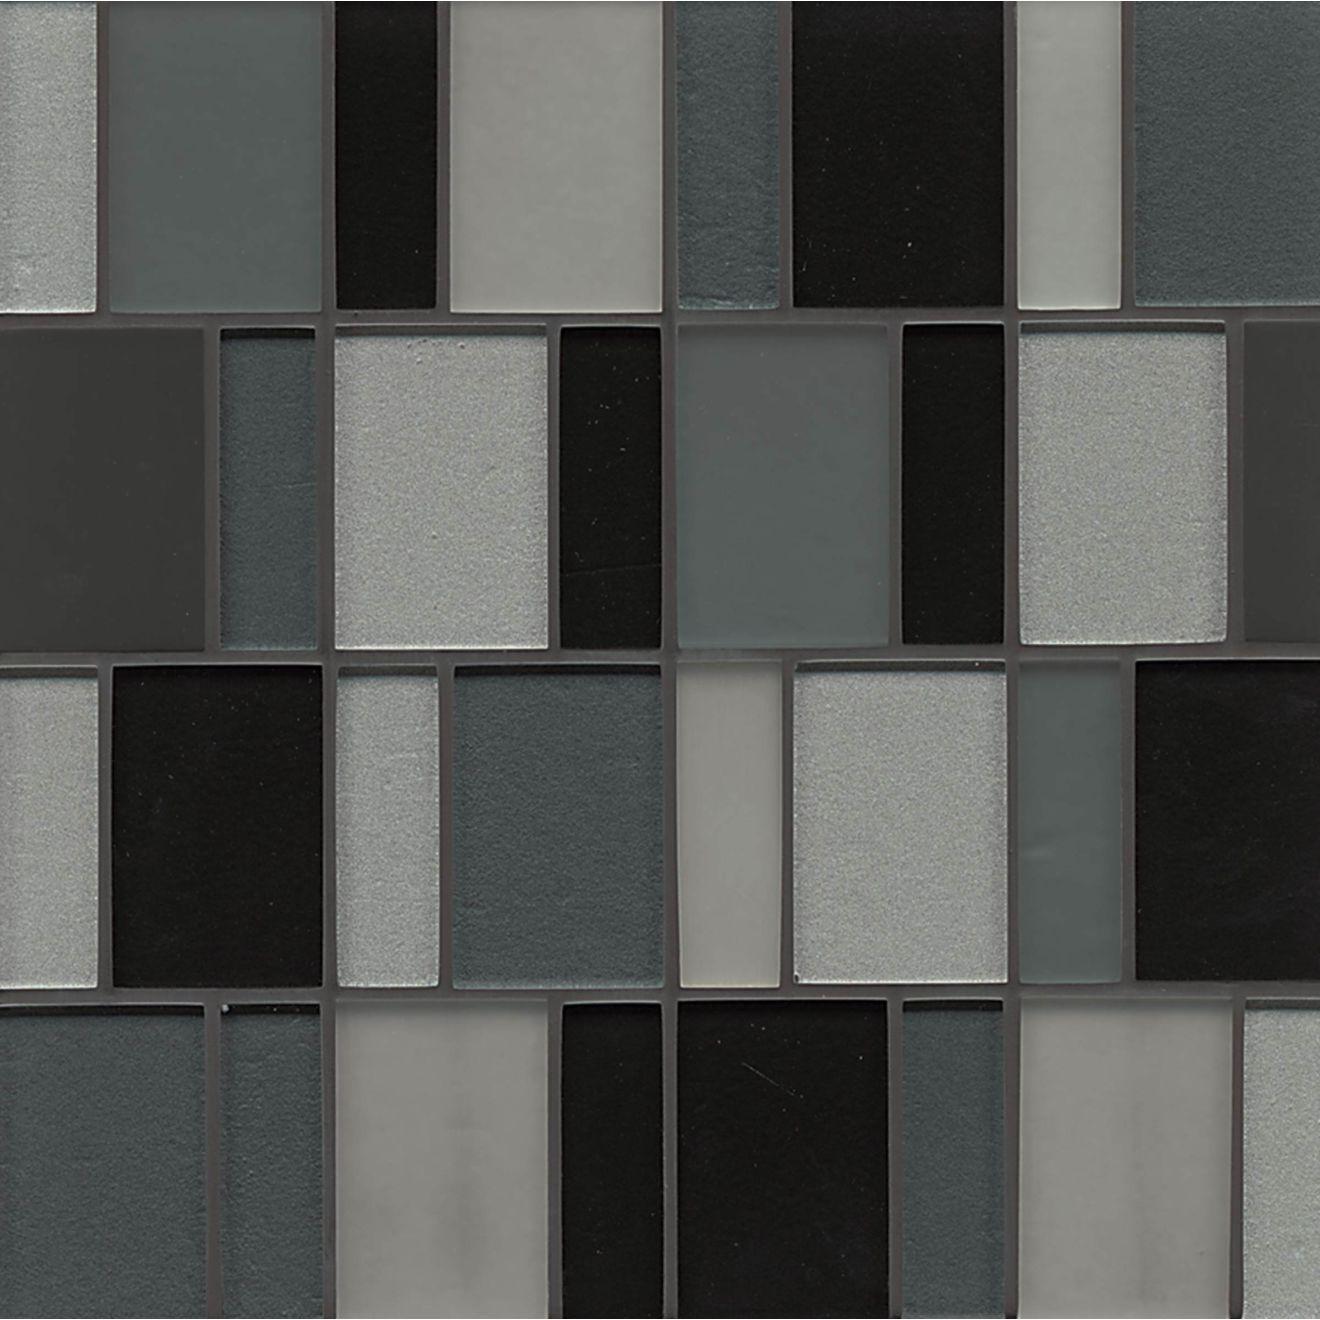 Manhattan Wall Mosaic in Wall Street